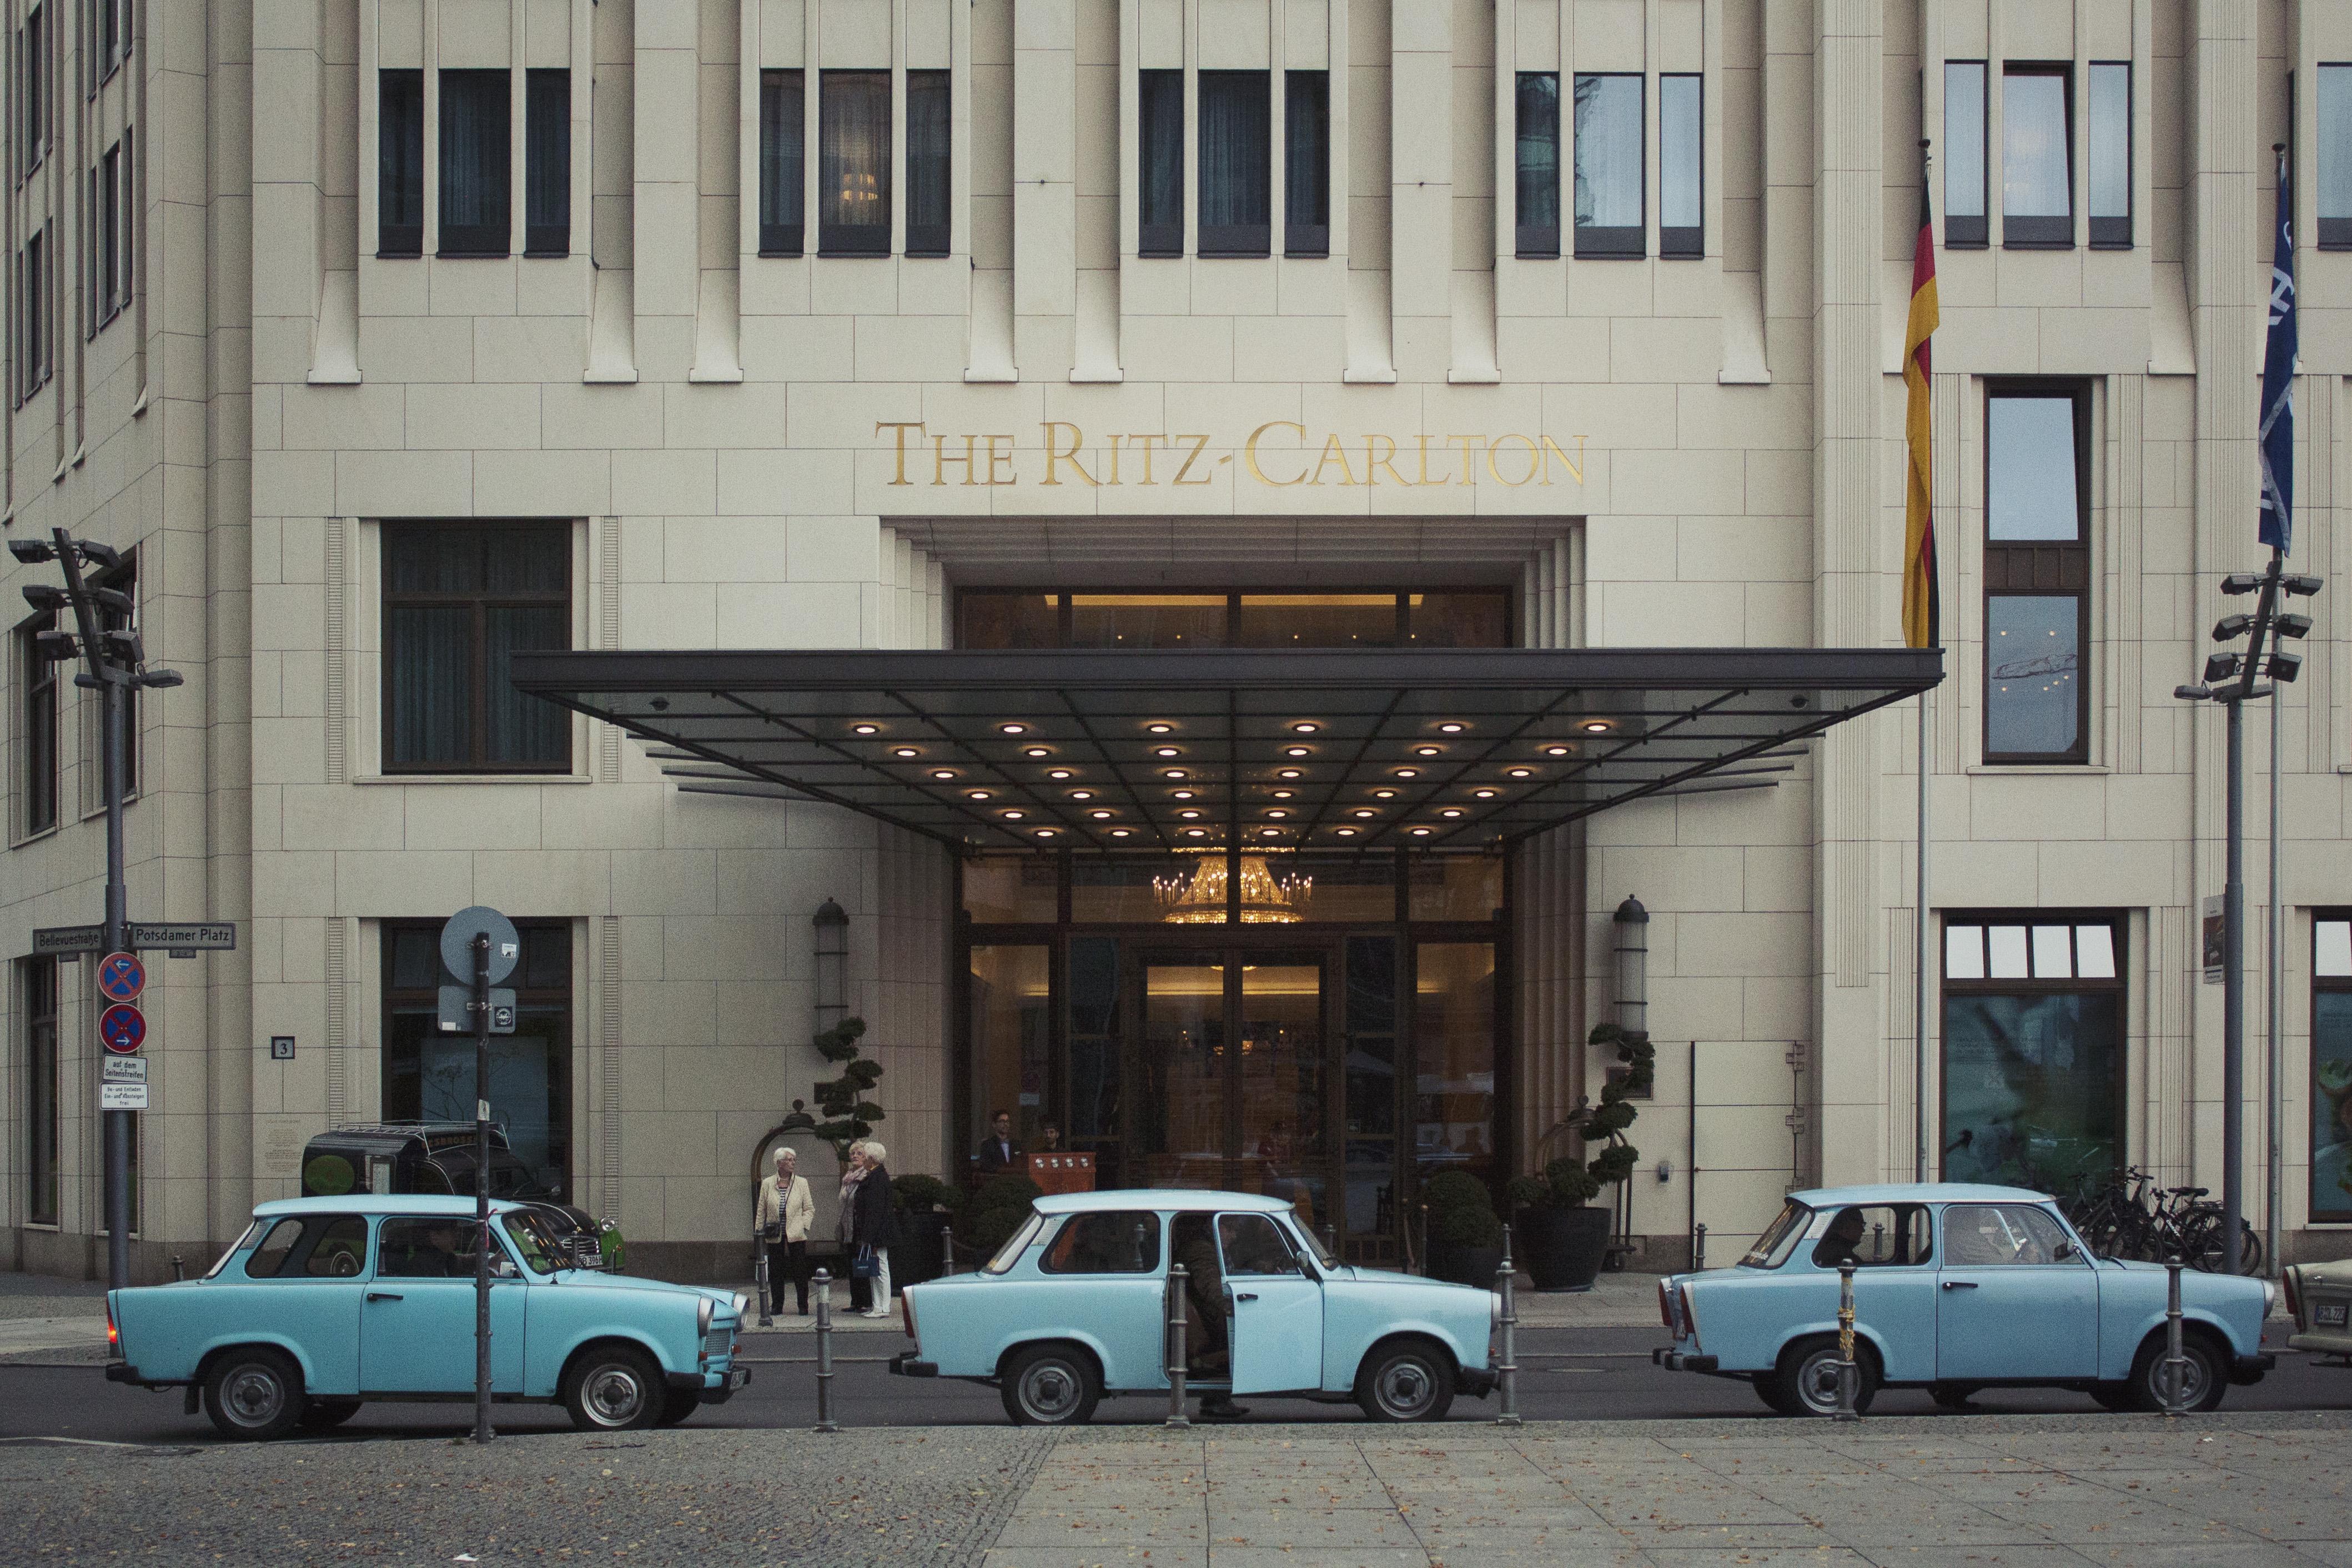 Berlin - Carlton & blue